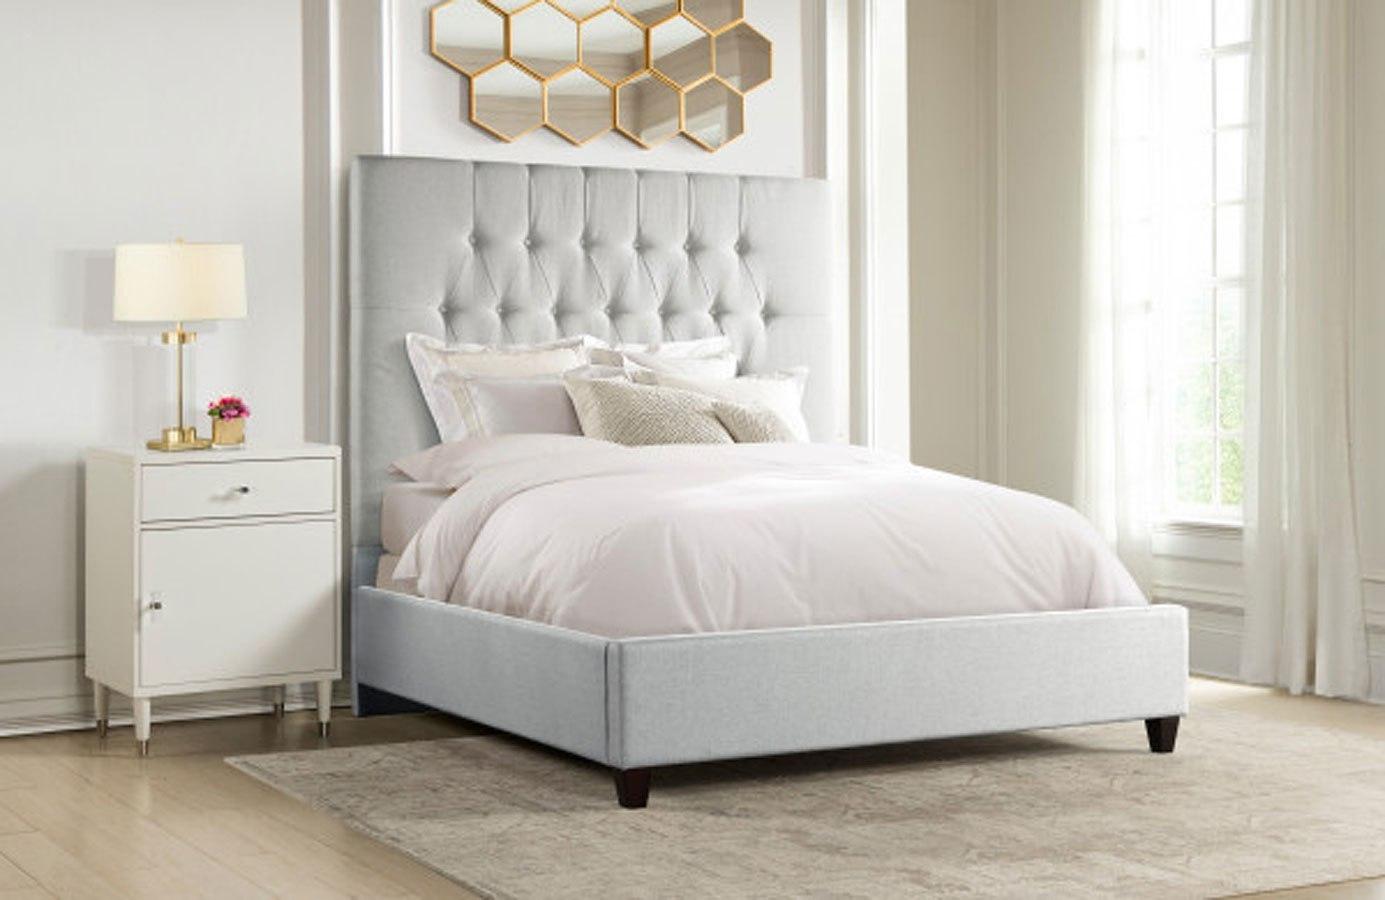 City Chic Diamond Tufted Panel Bedroom Set (Light Grey) Accentrics Home    Furniture Cart